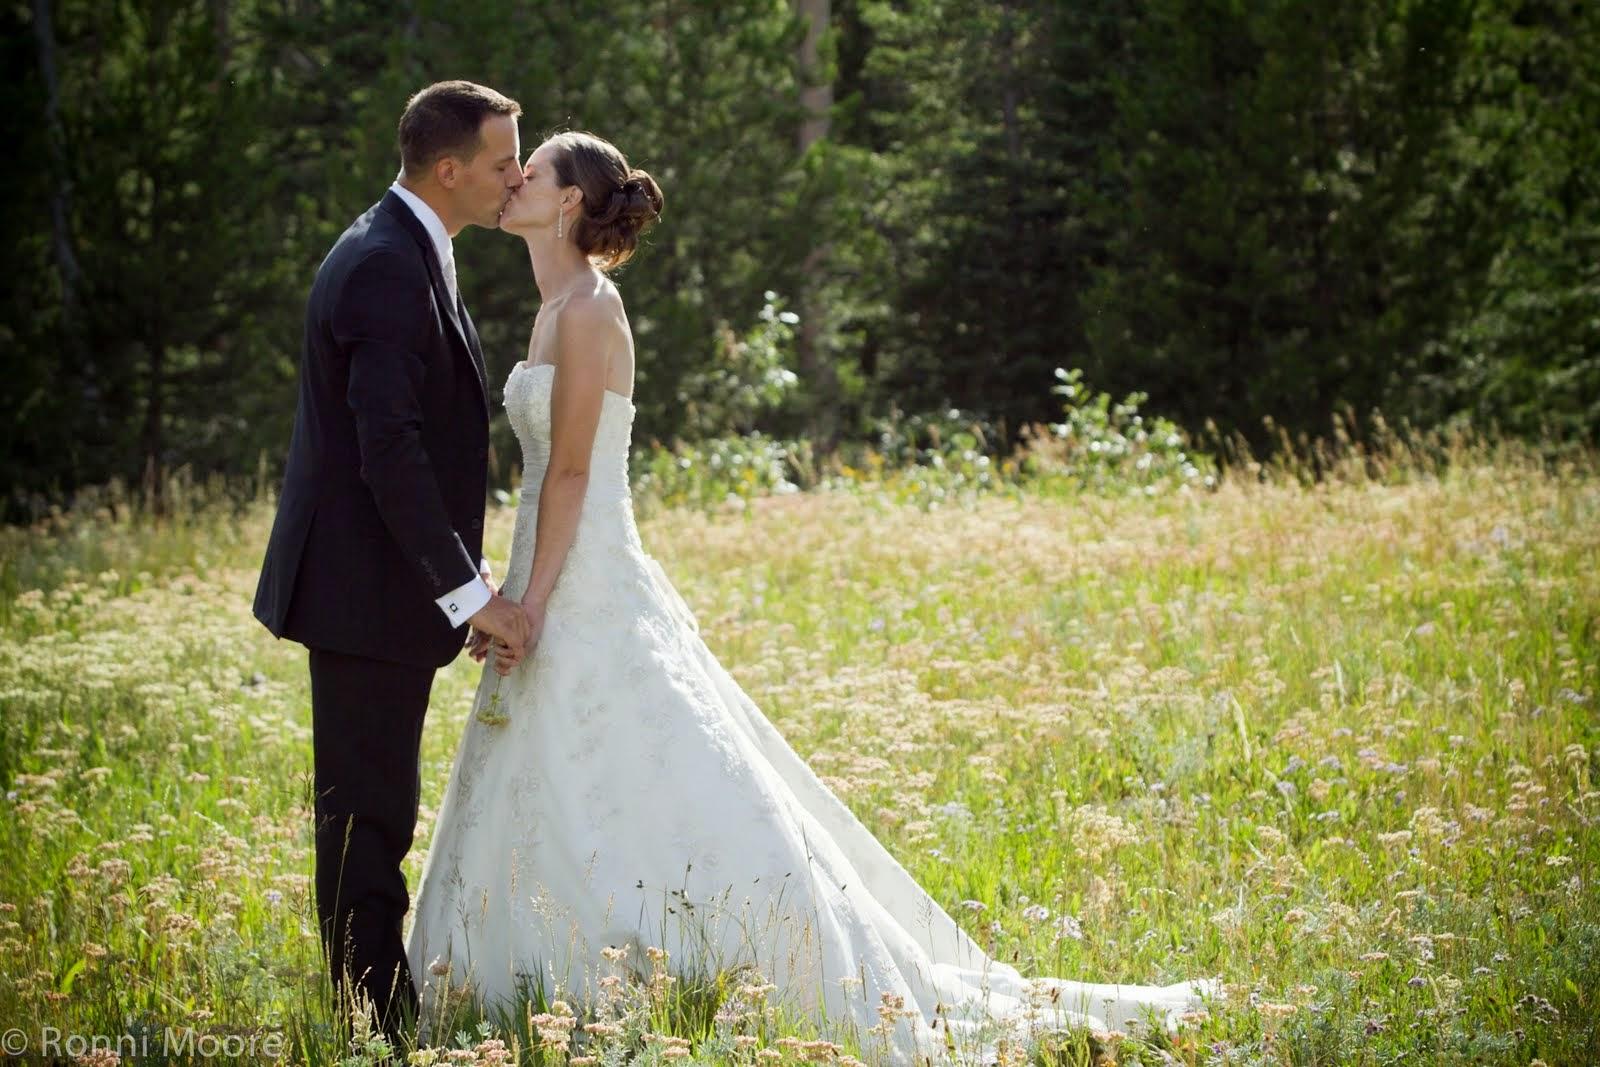 Romantic wedding wallpaper - Romantic wedding kiss